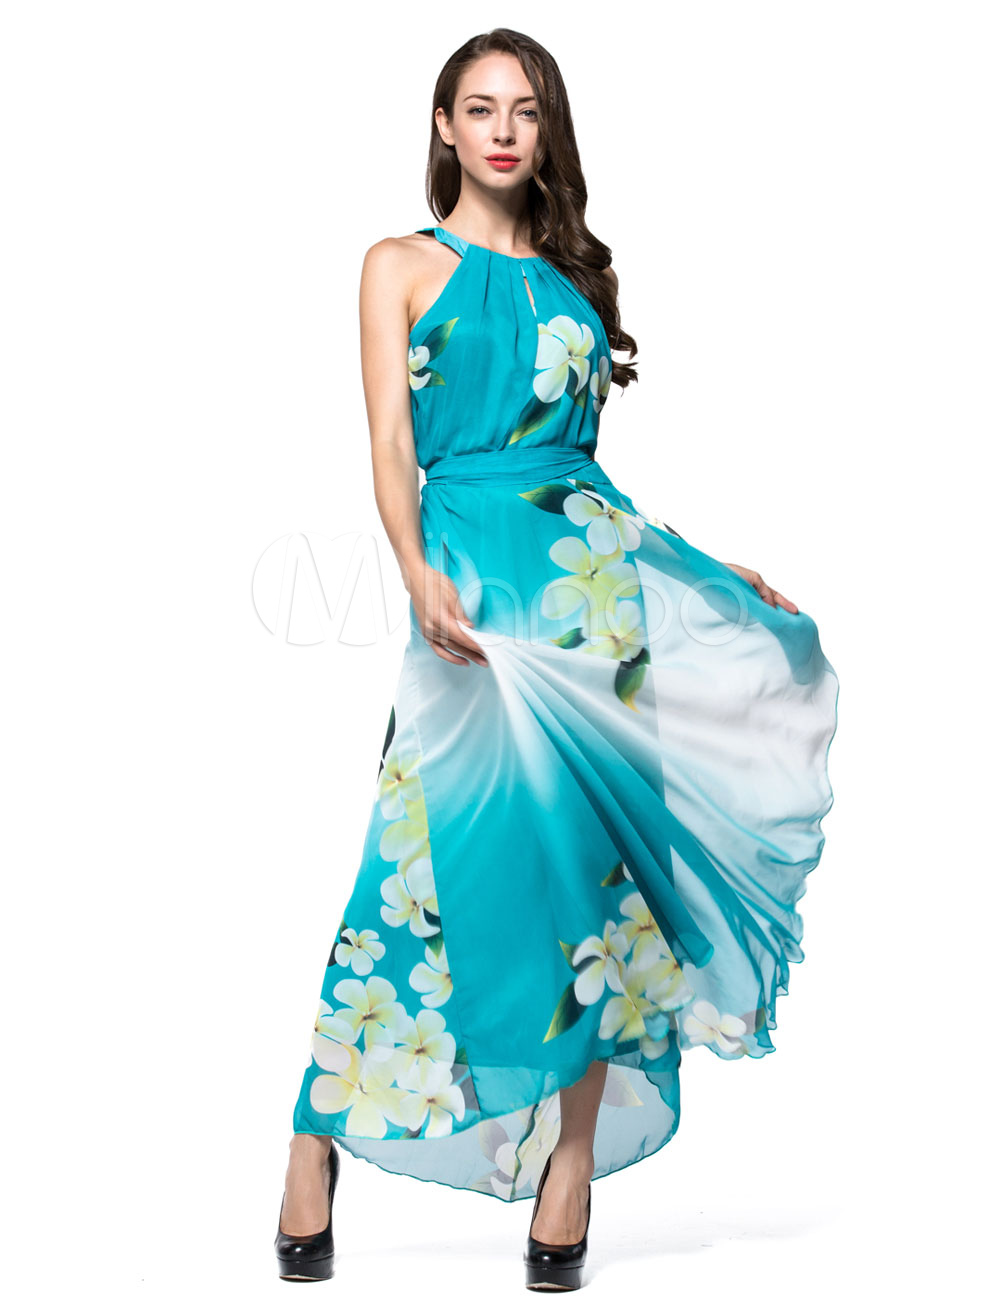 Plus Size Maxi Dress Women's Boho Chiffon Crewneck Sleeveless Floral Printed Cut Out Floor Length Dress